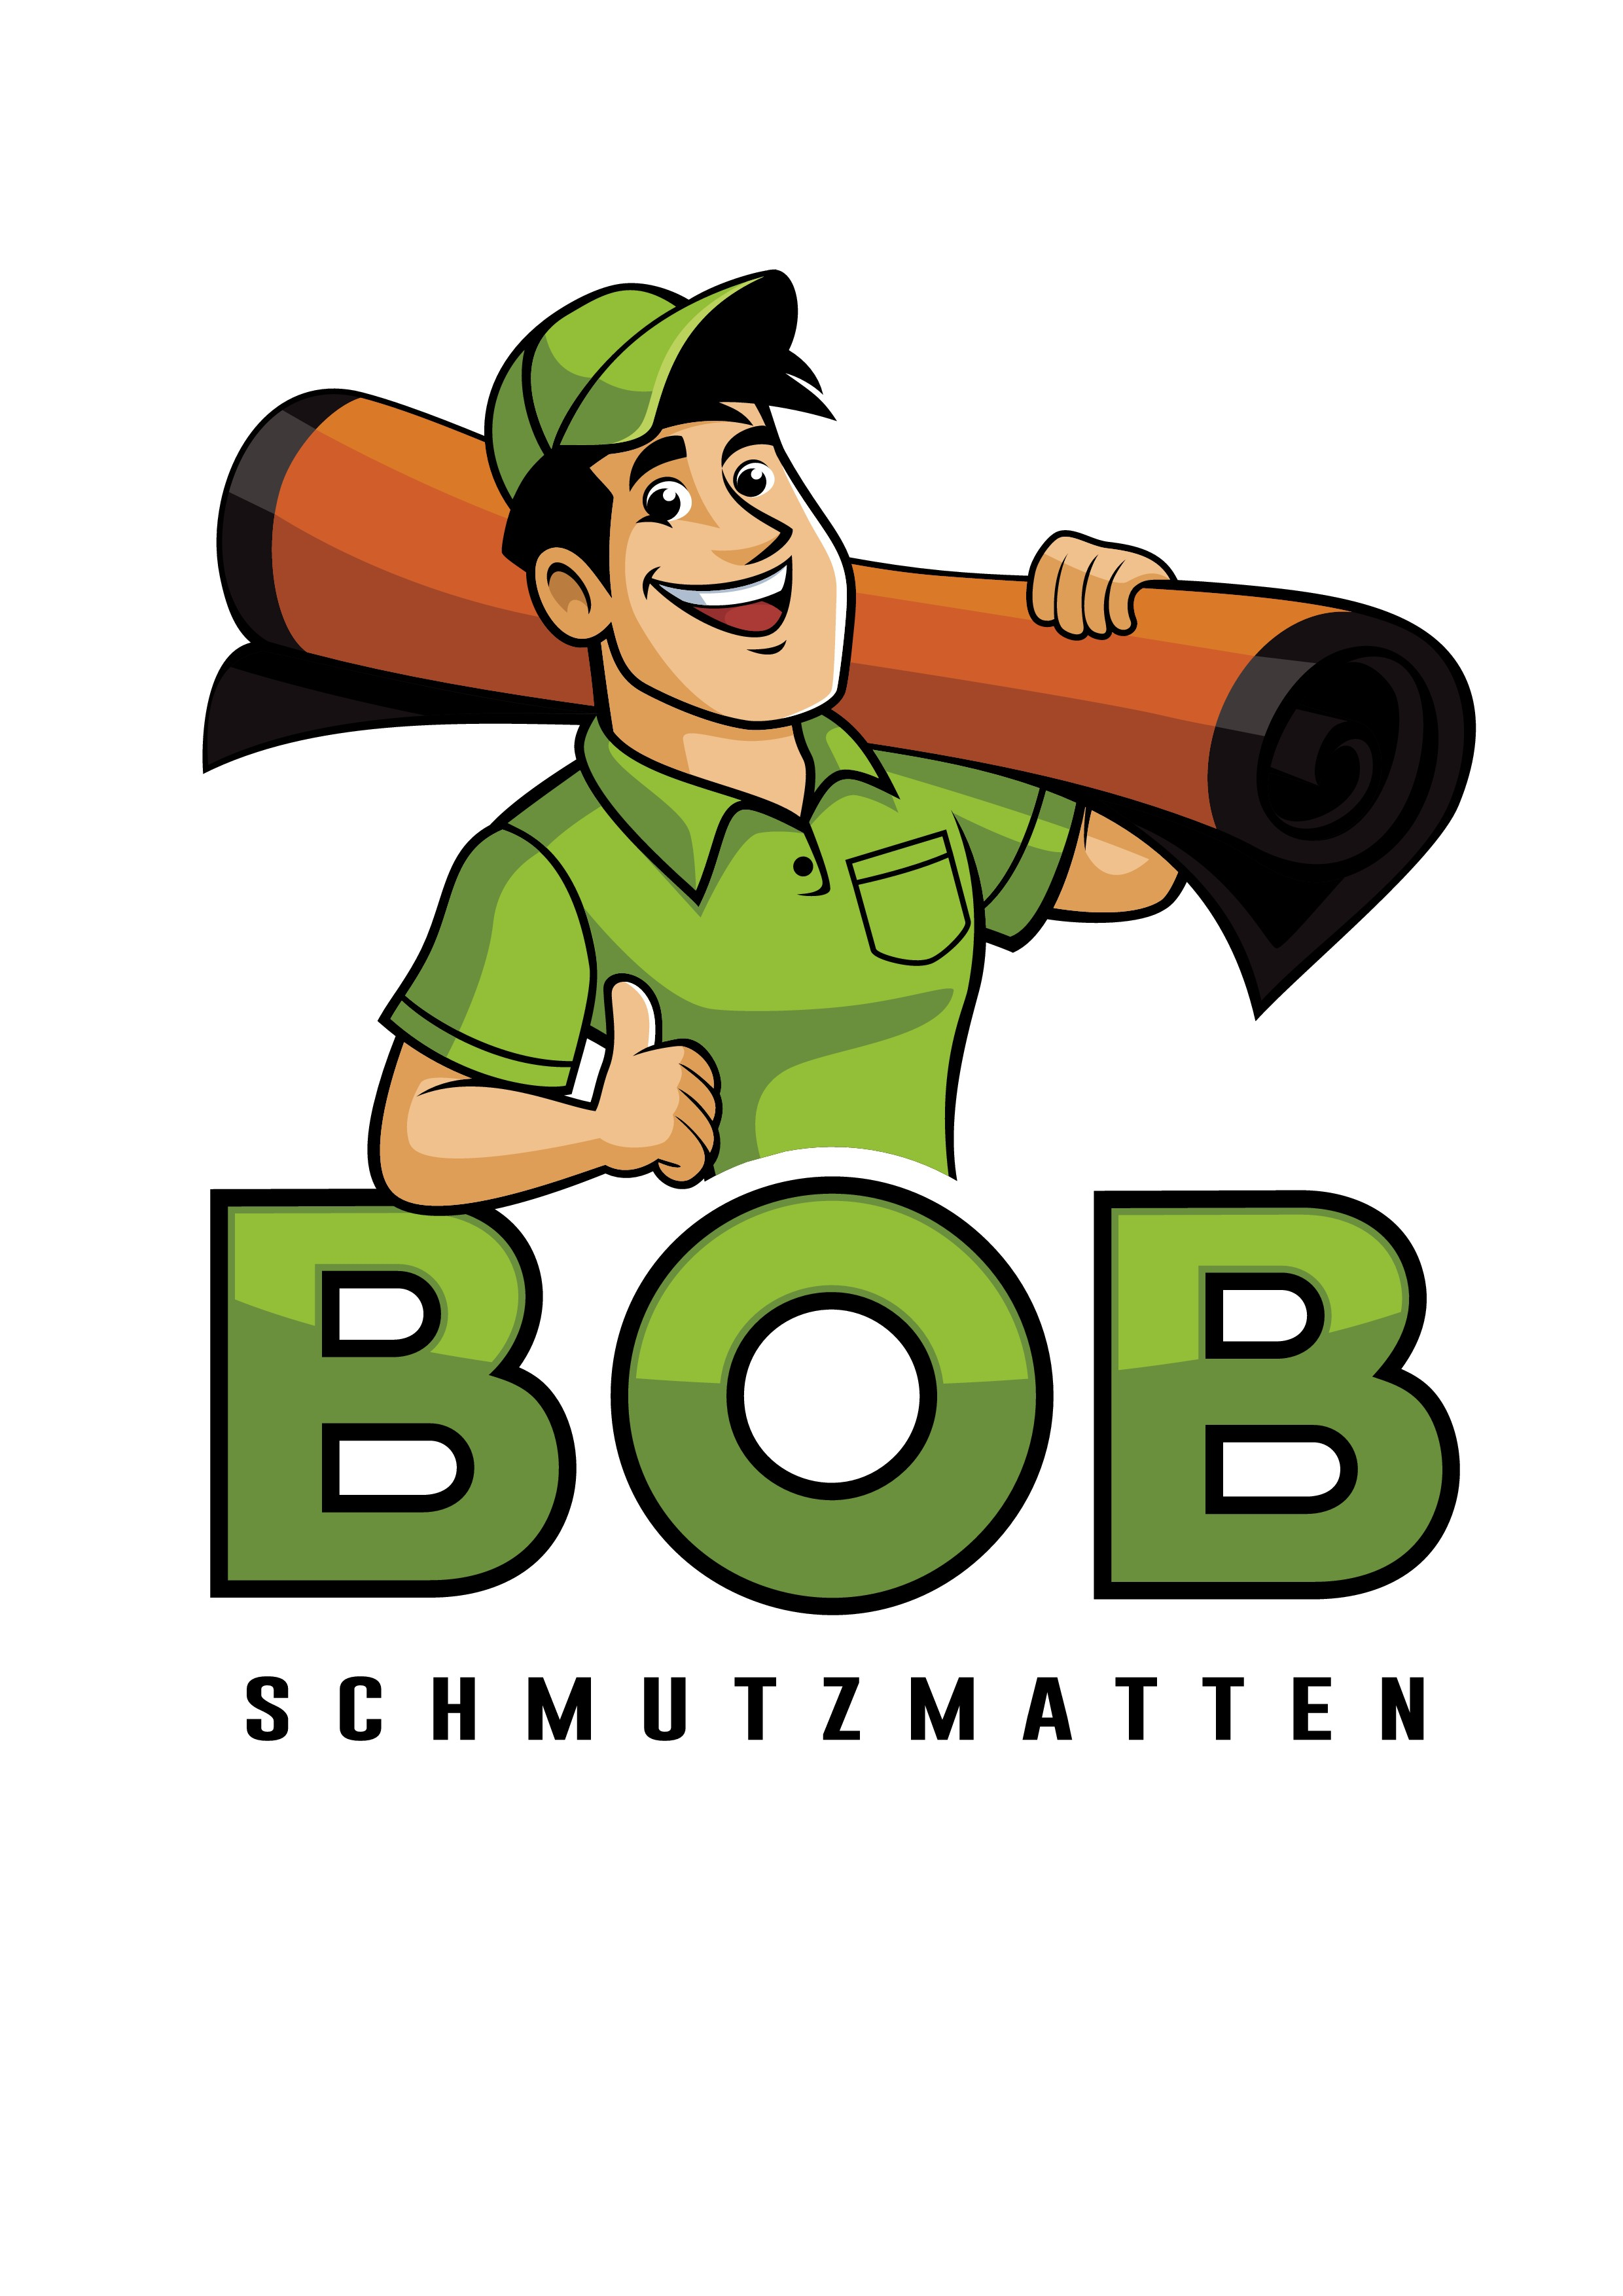 +++ Logo Design for a dirt mat company / Logo für Schmutzmatten-Unternehmen +++